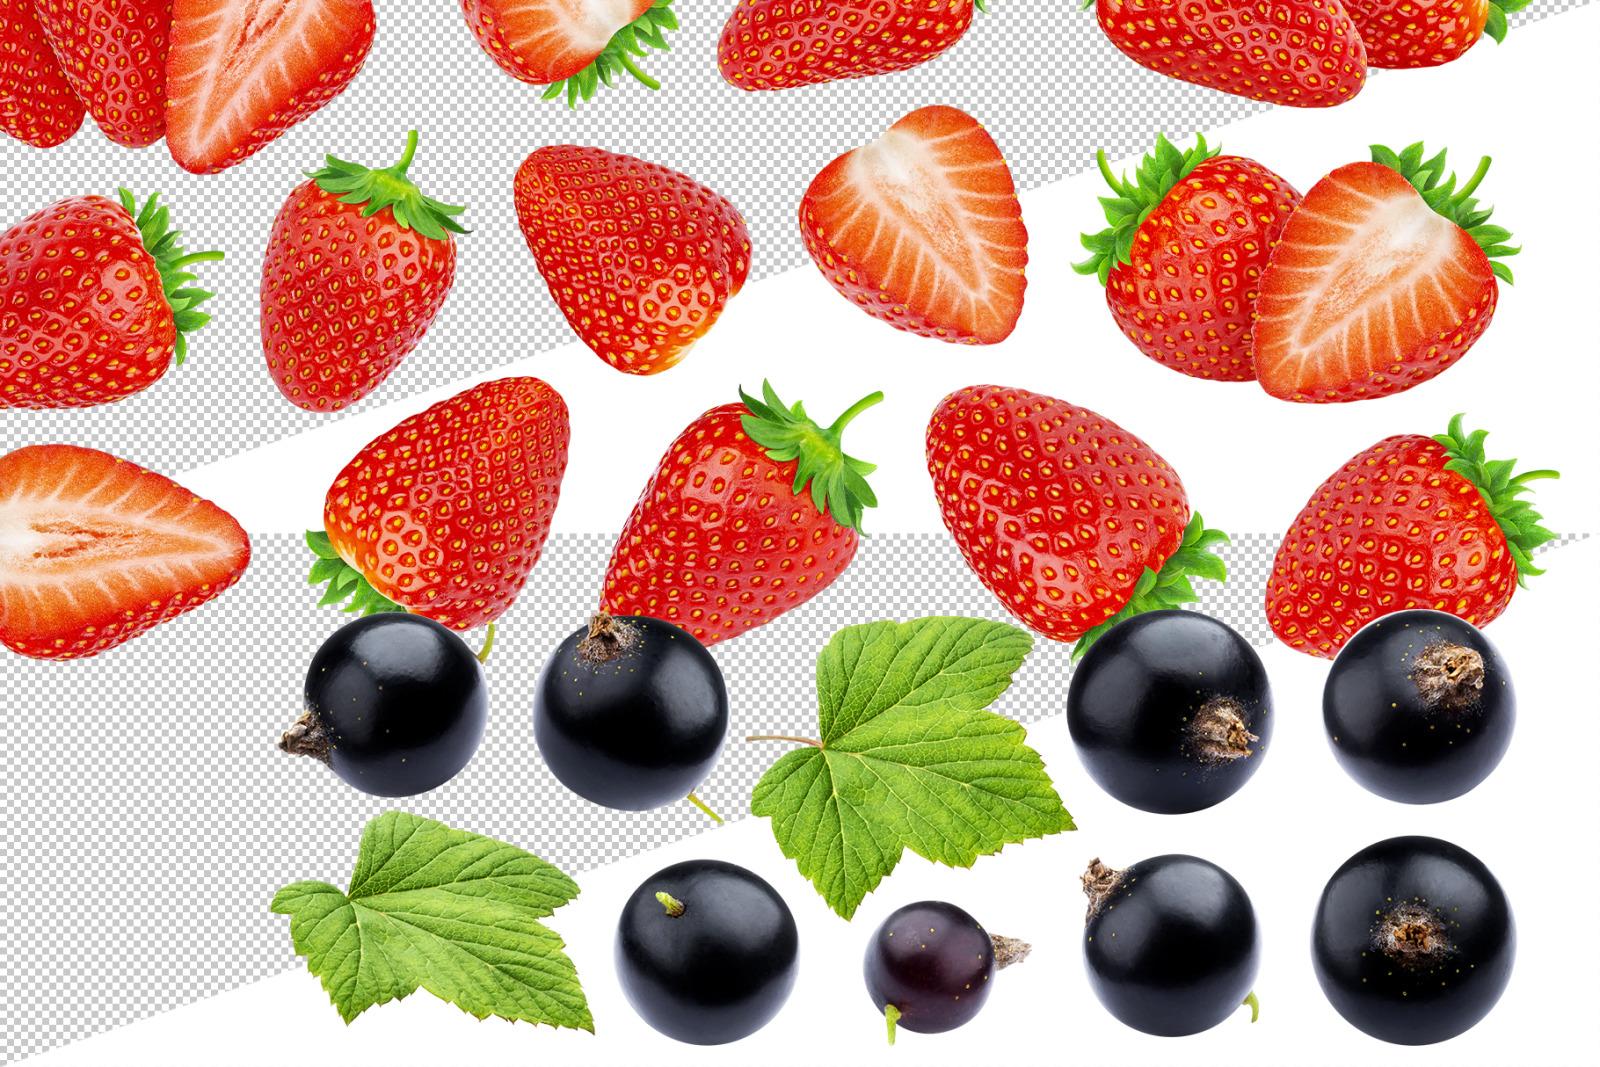 Berry set on transparent background